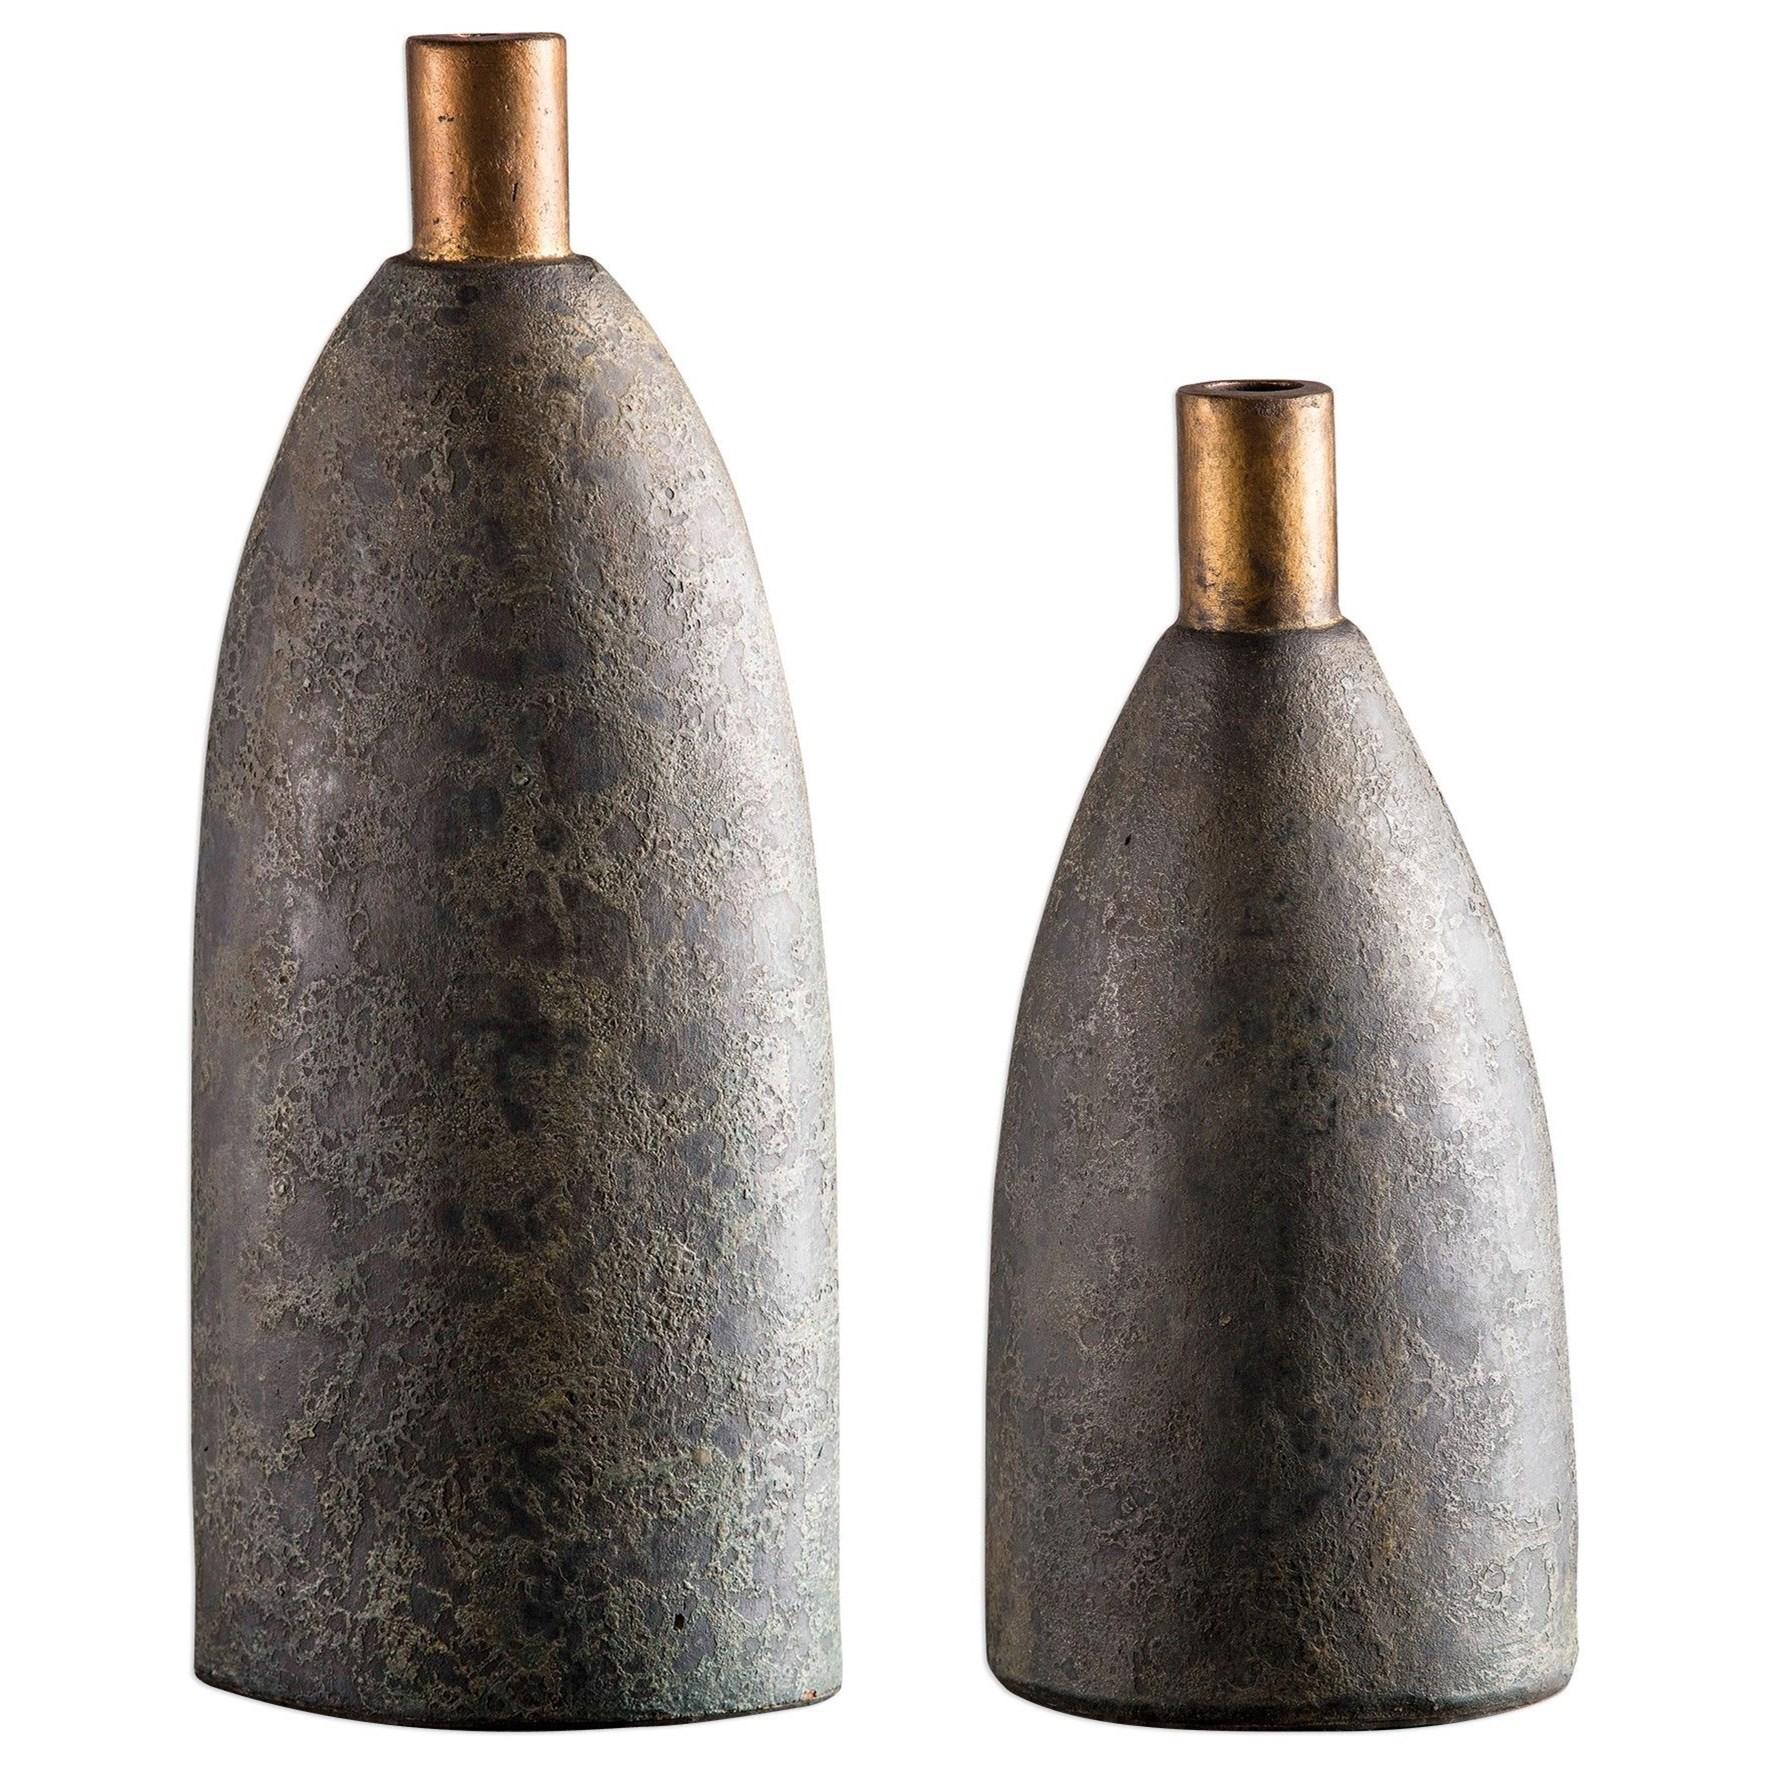 Kasen Charcoal Vases S/2